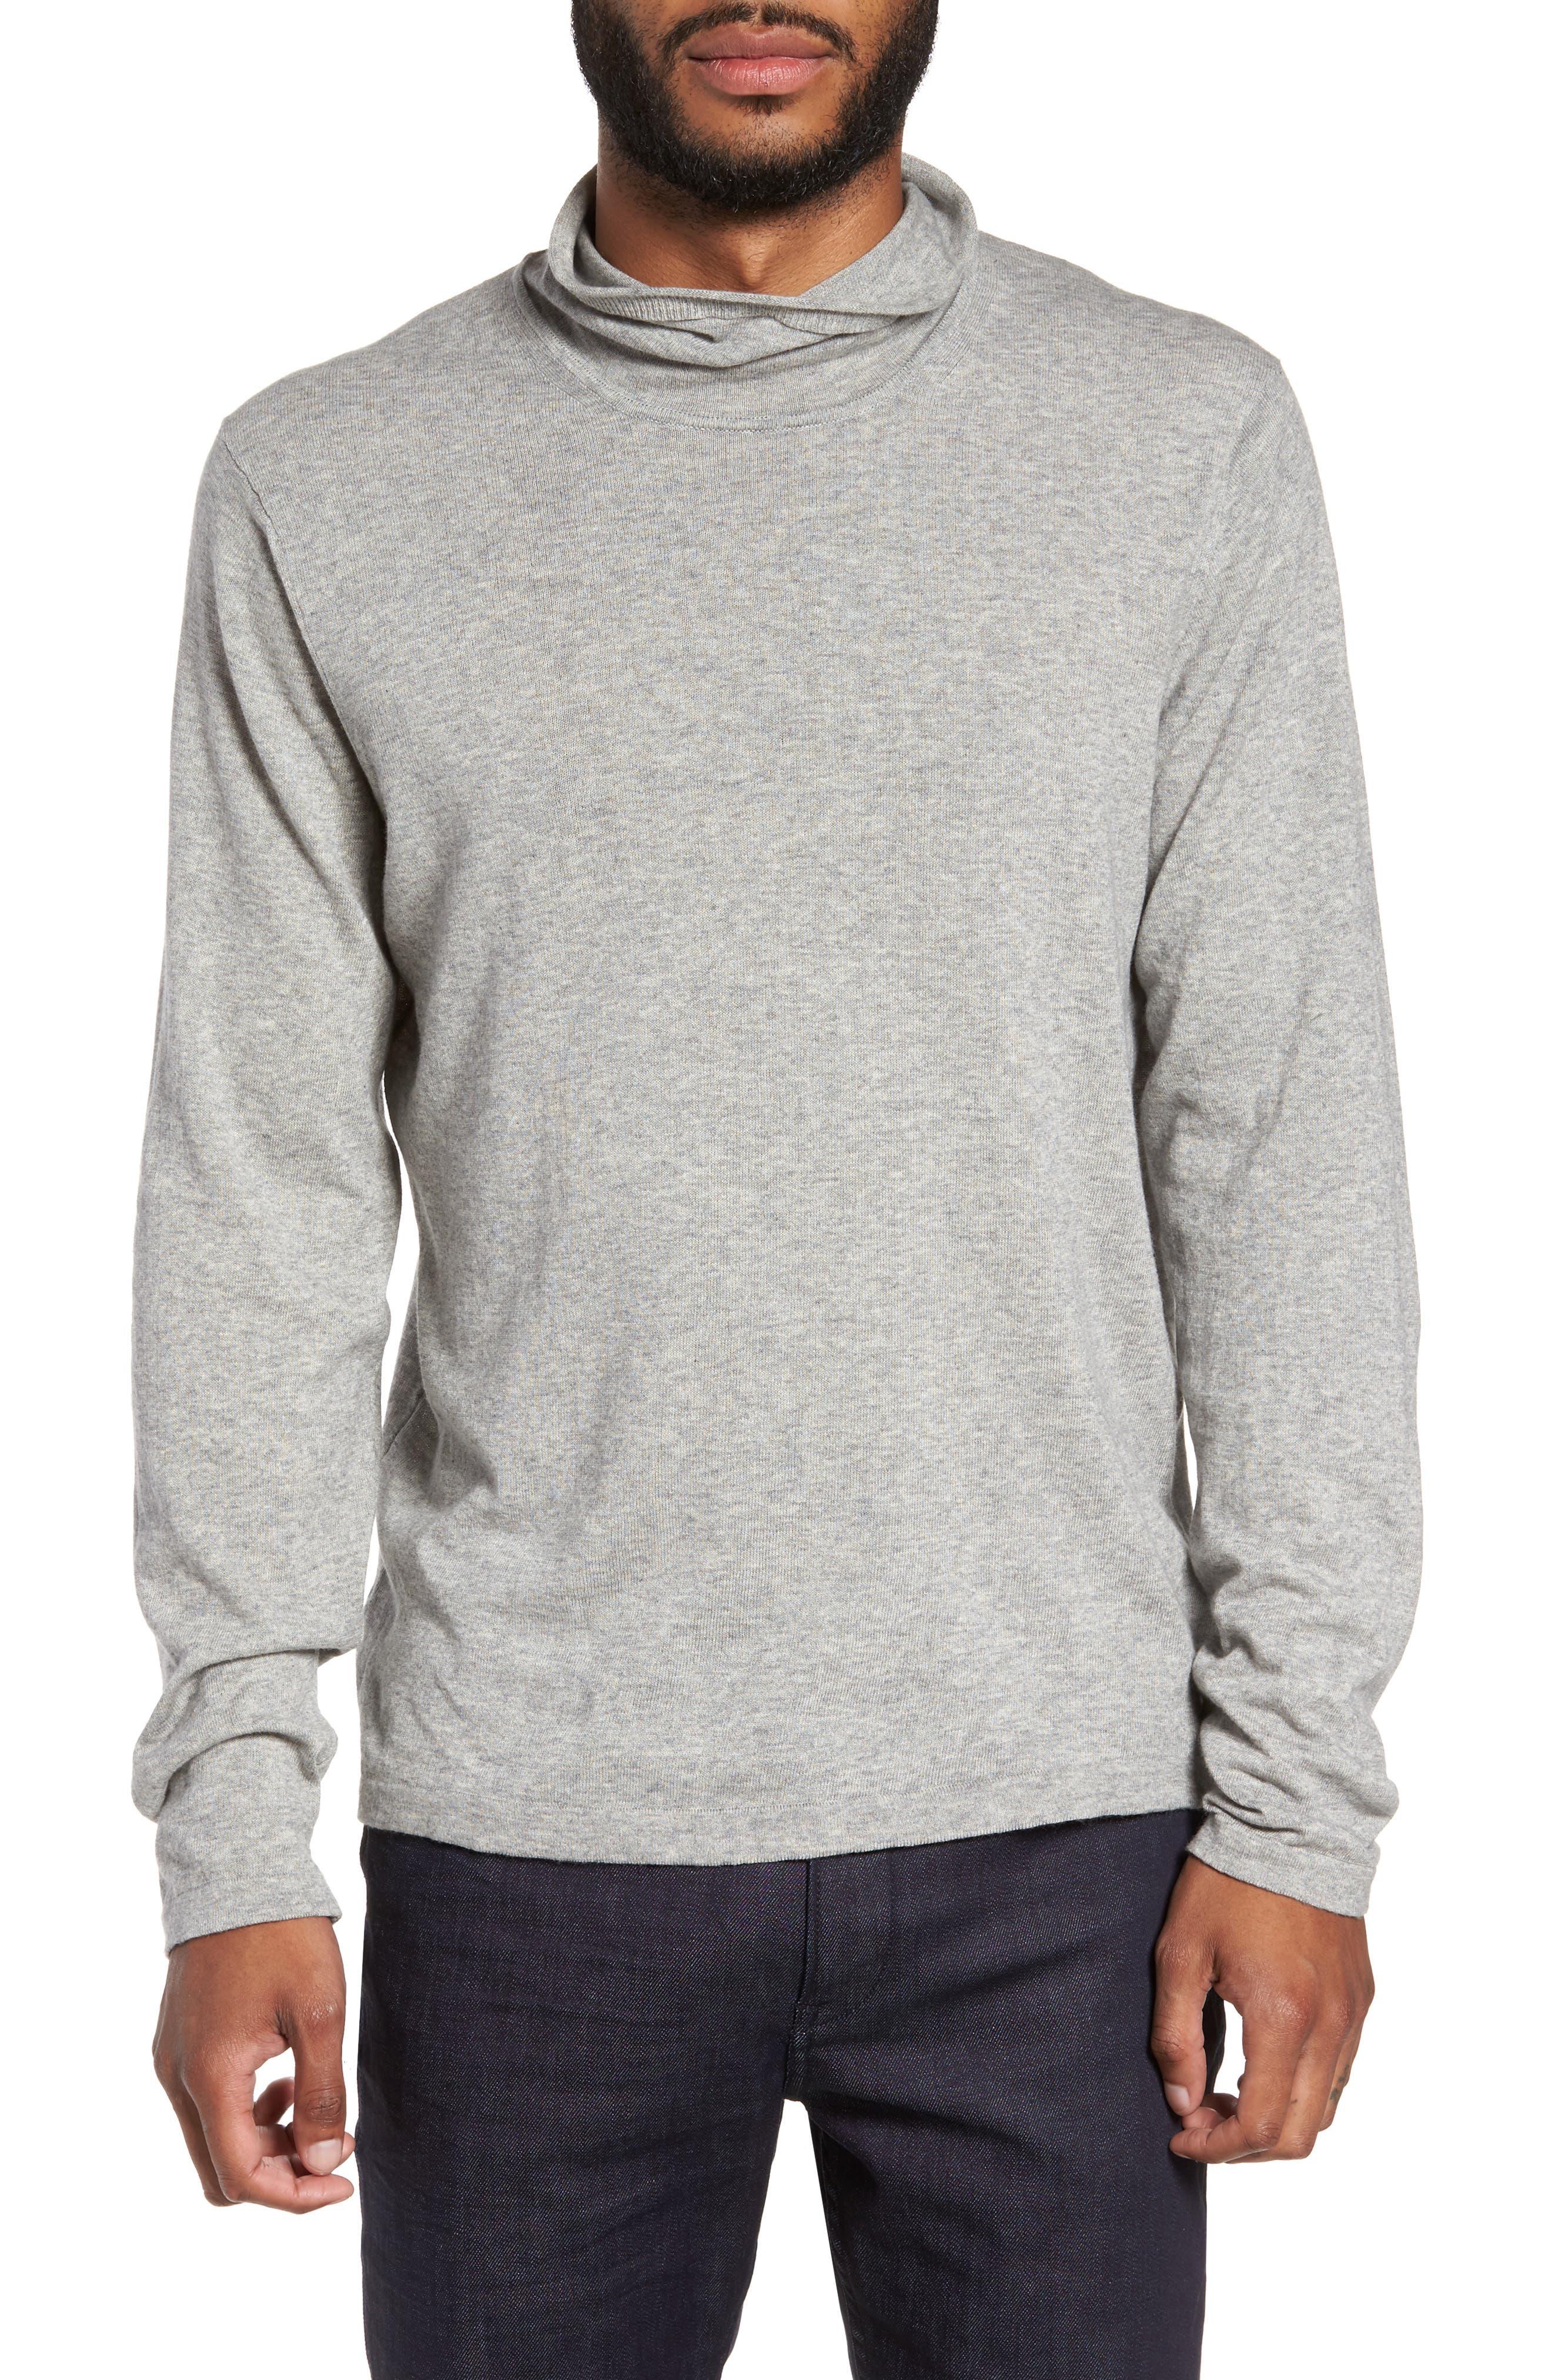 Hess Wool Turtleneck Sweater,                             Main thumbnail 1, color,